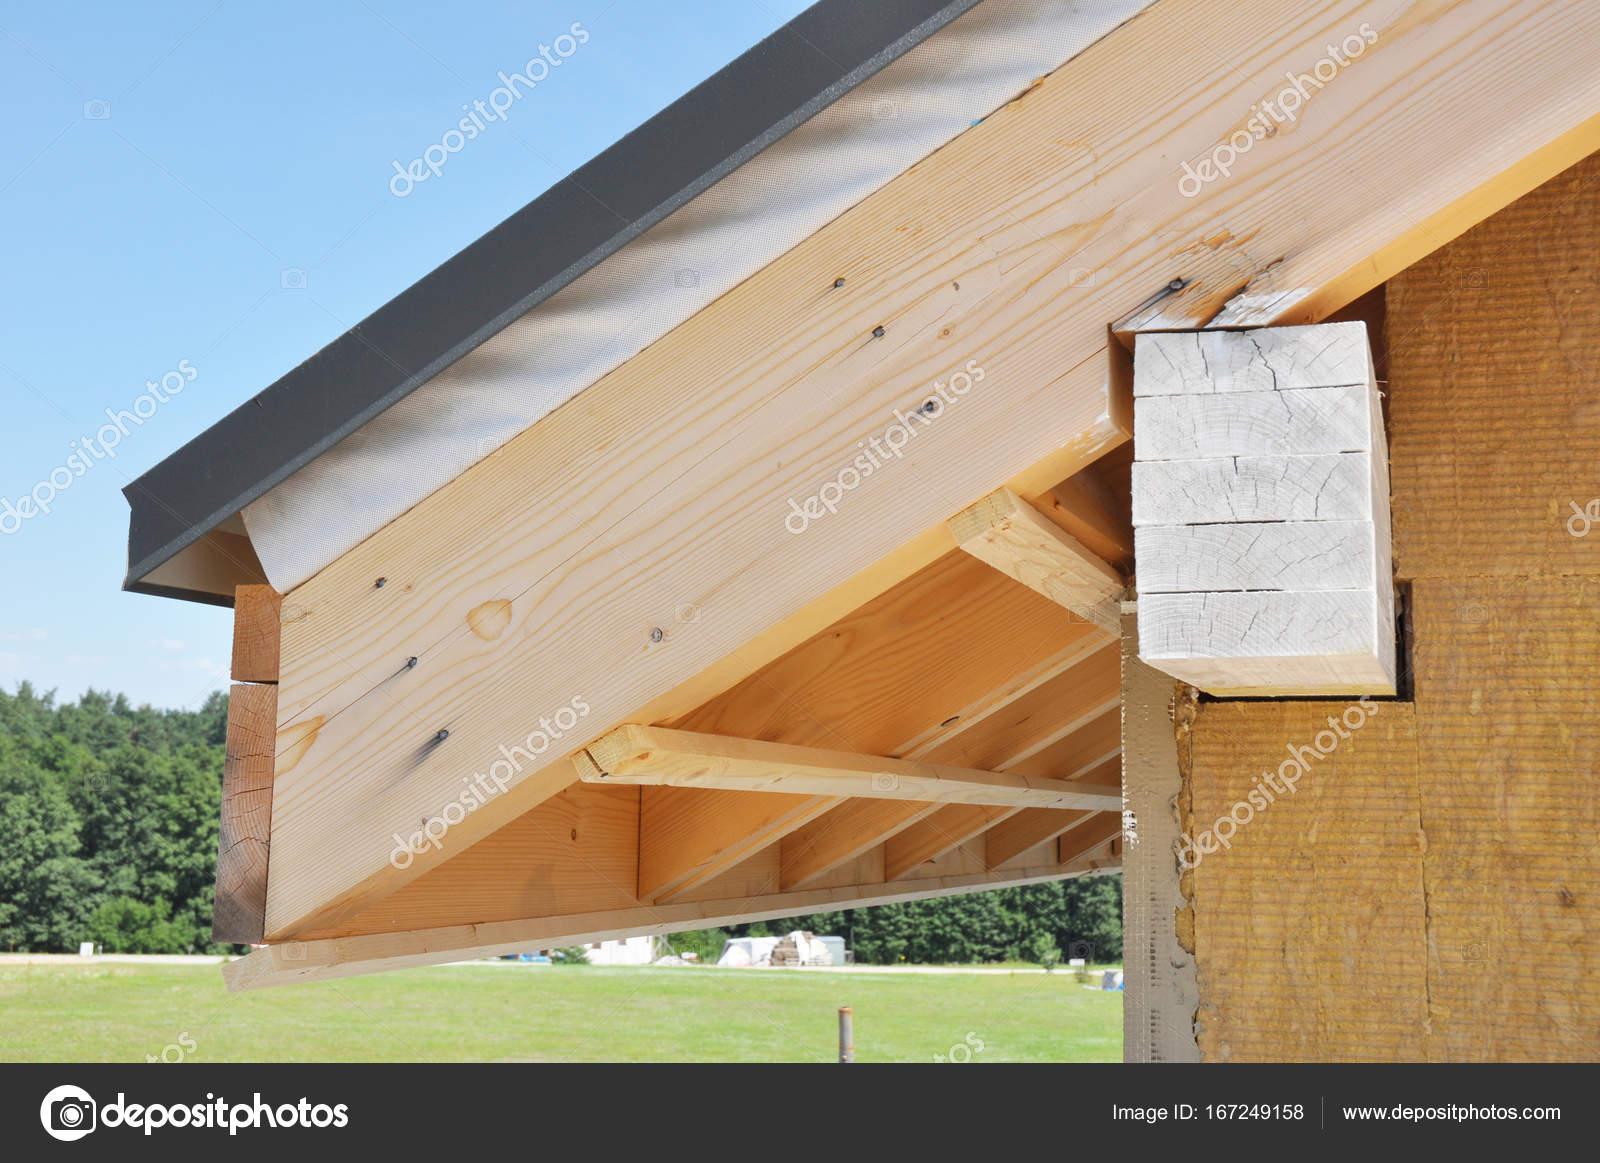 Unfertige Haus Dach Ecke Mit Wanddammung Attic Bau Und Dachboden